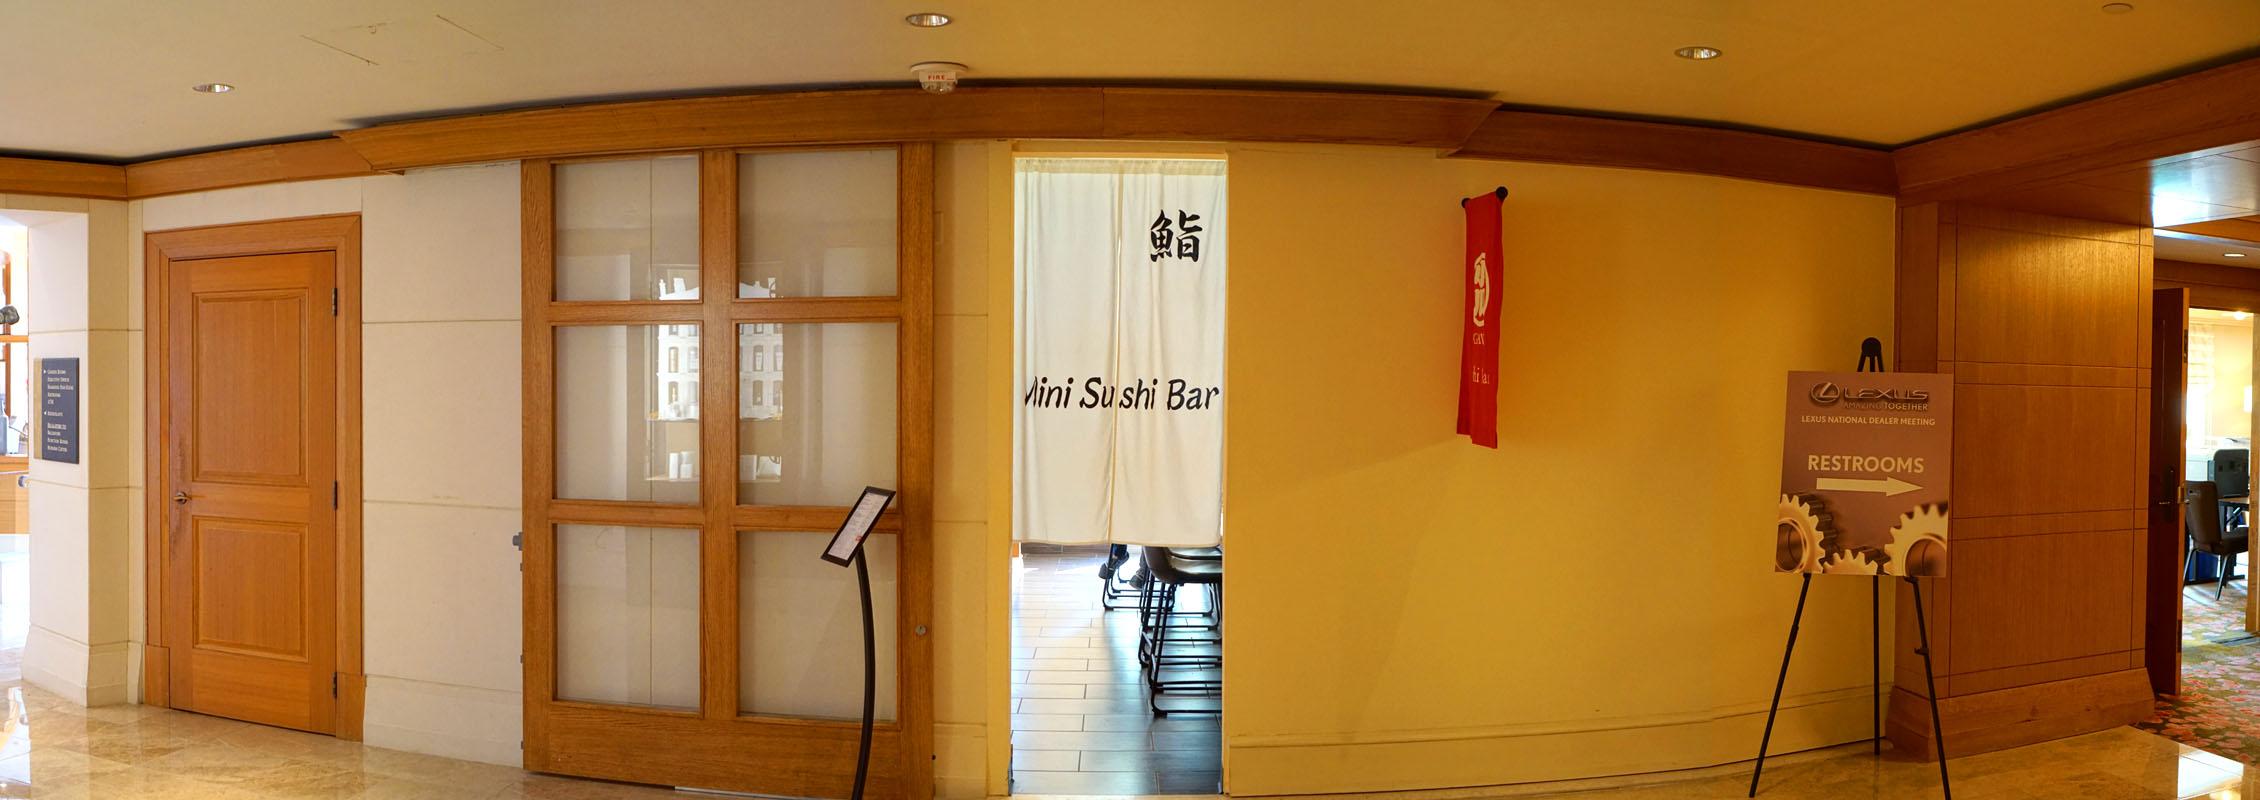 Mini Sushi Bar Exterior